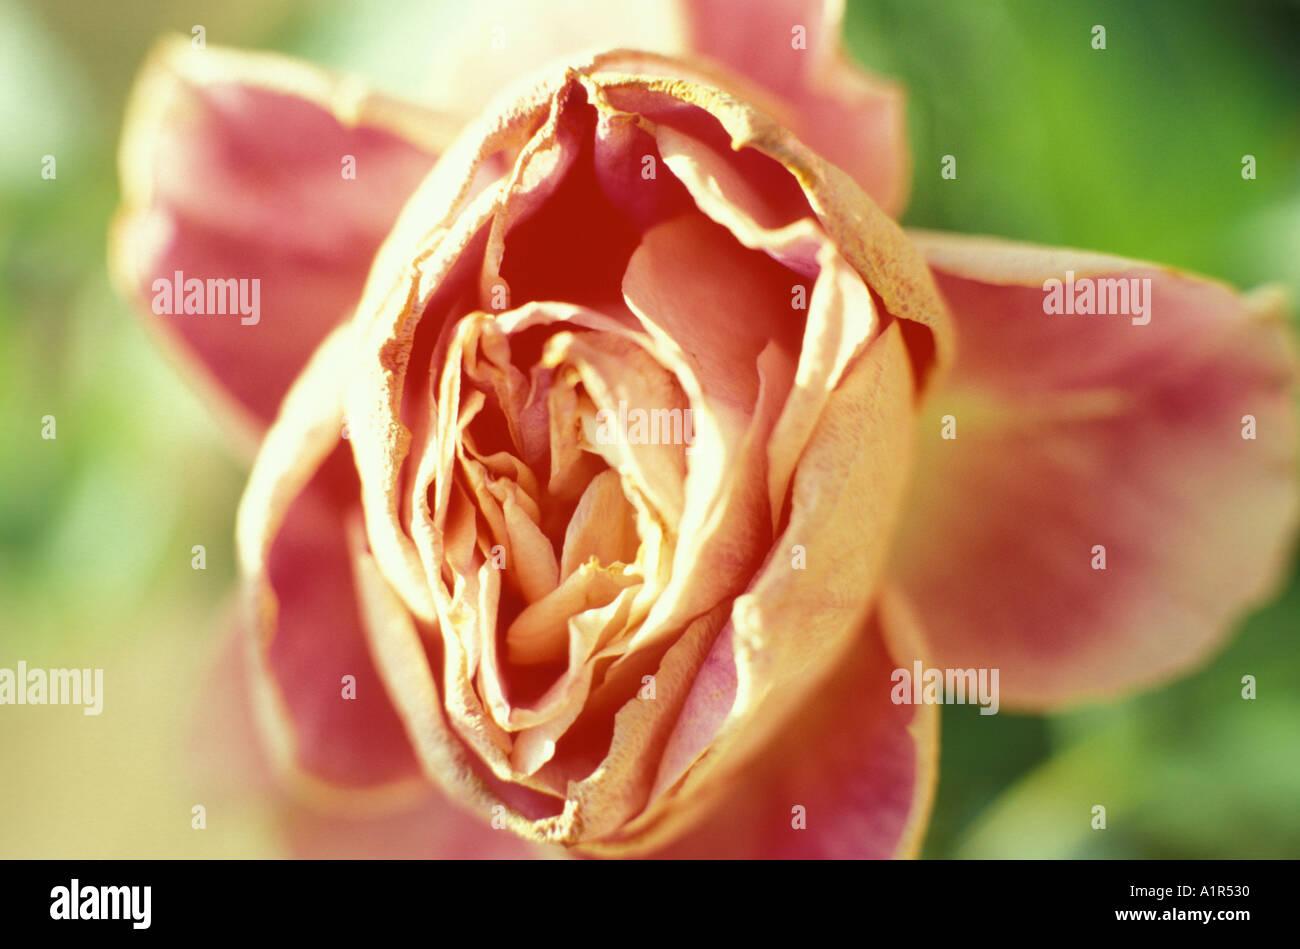 Rose, close-up Stockbild